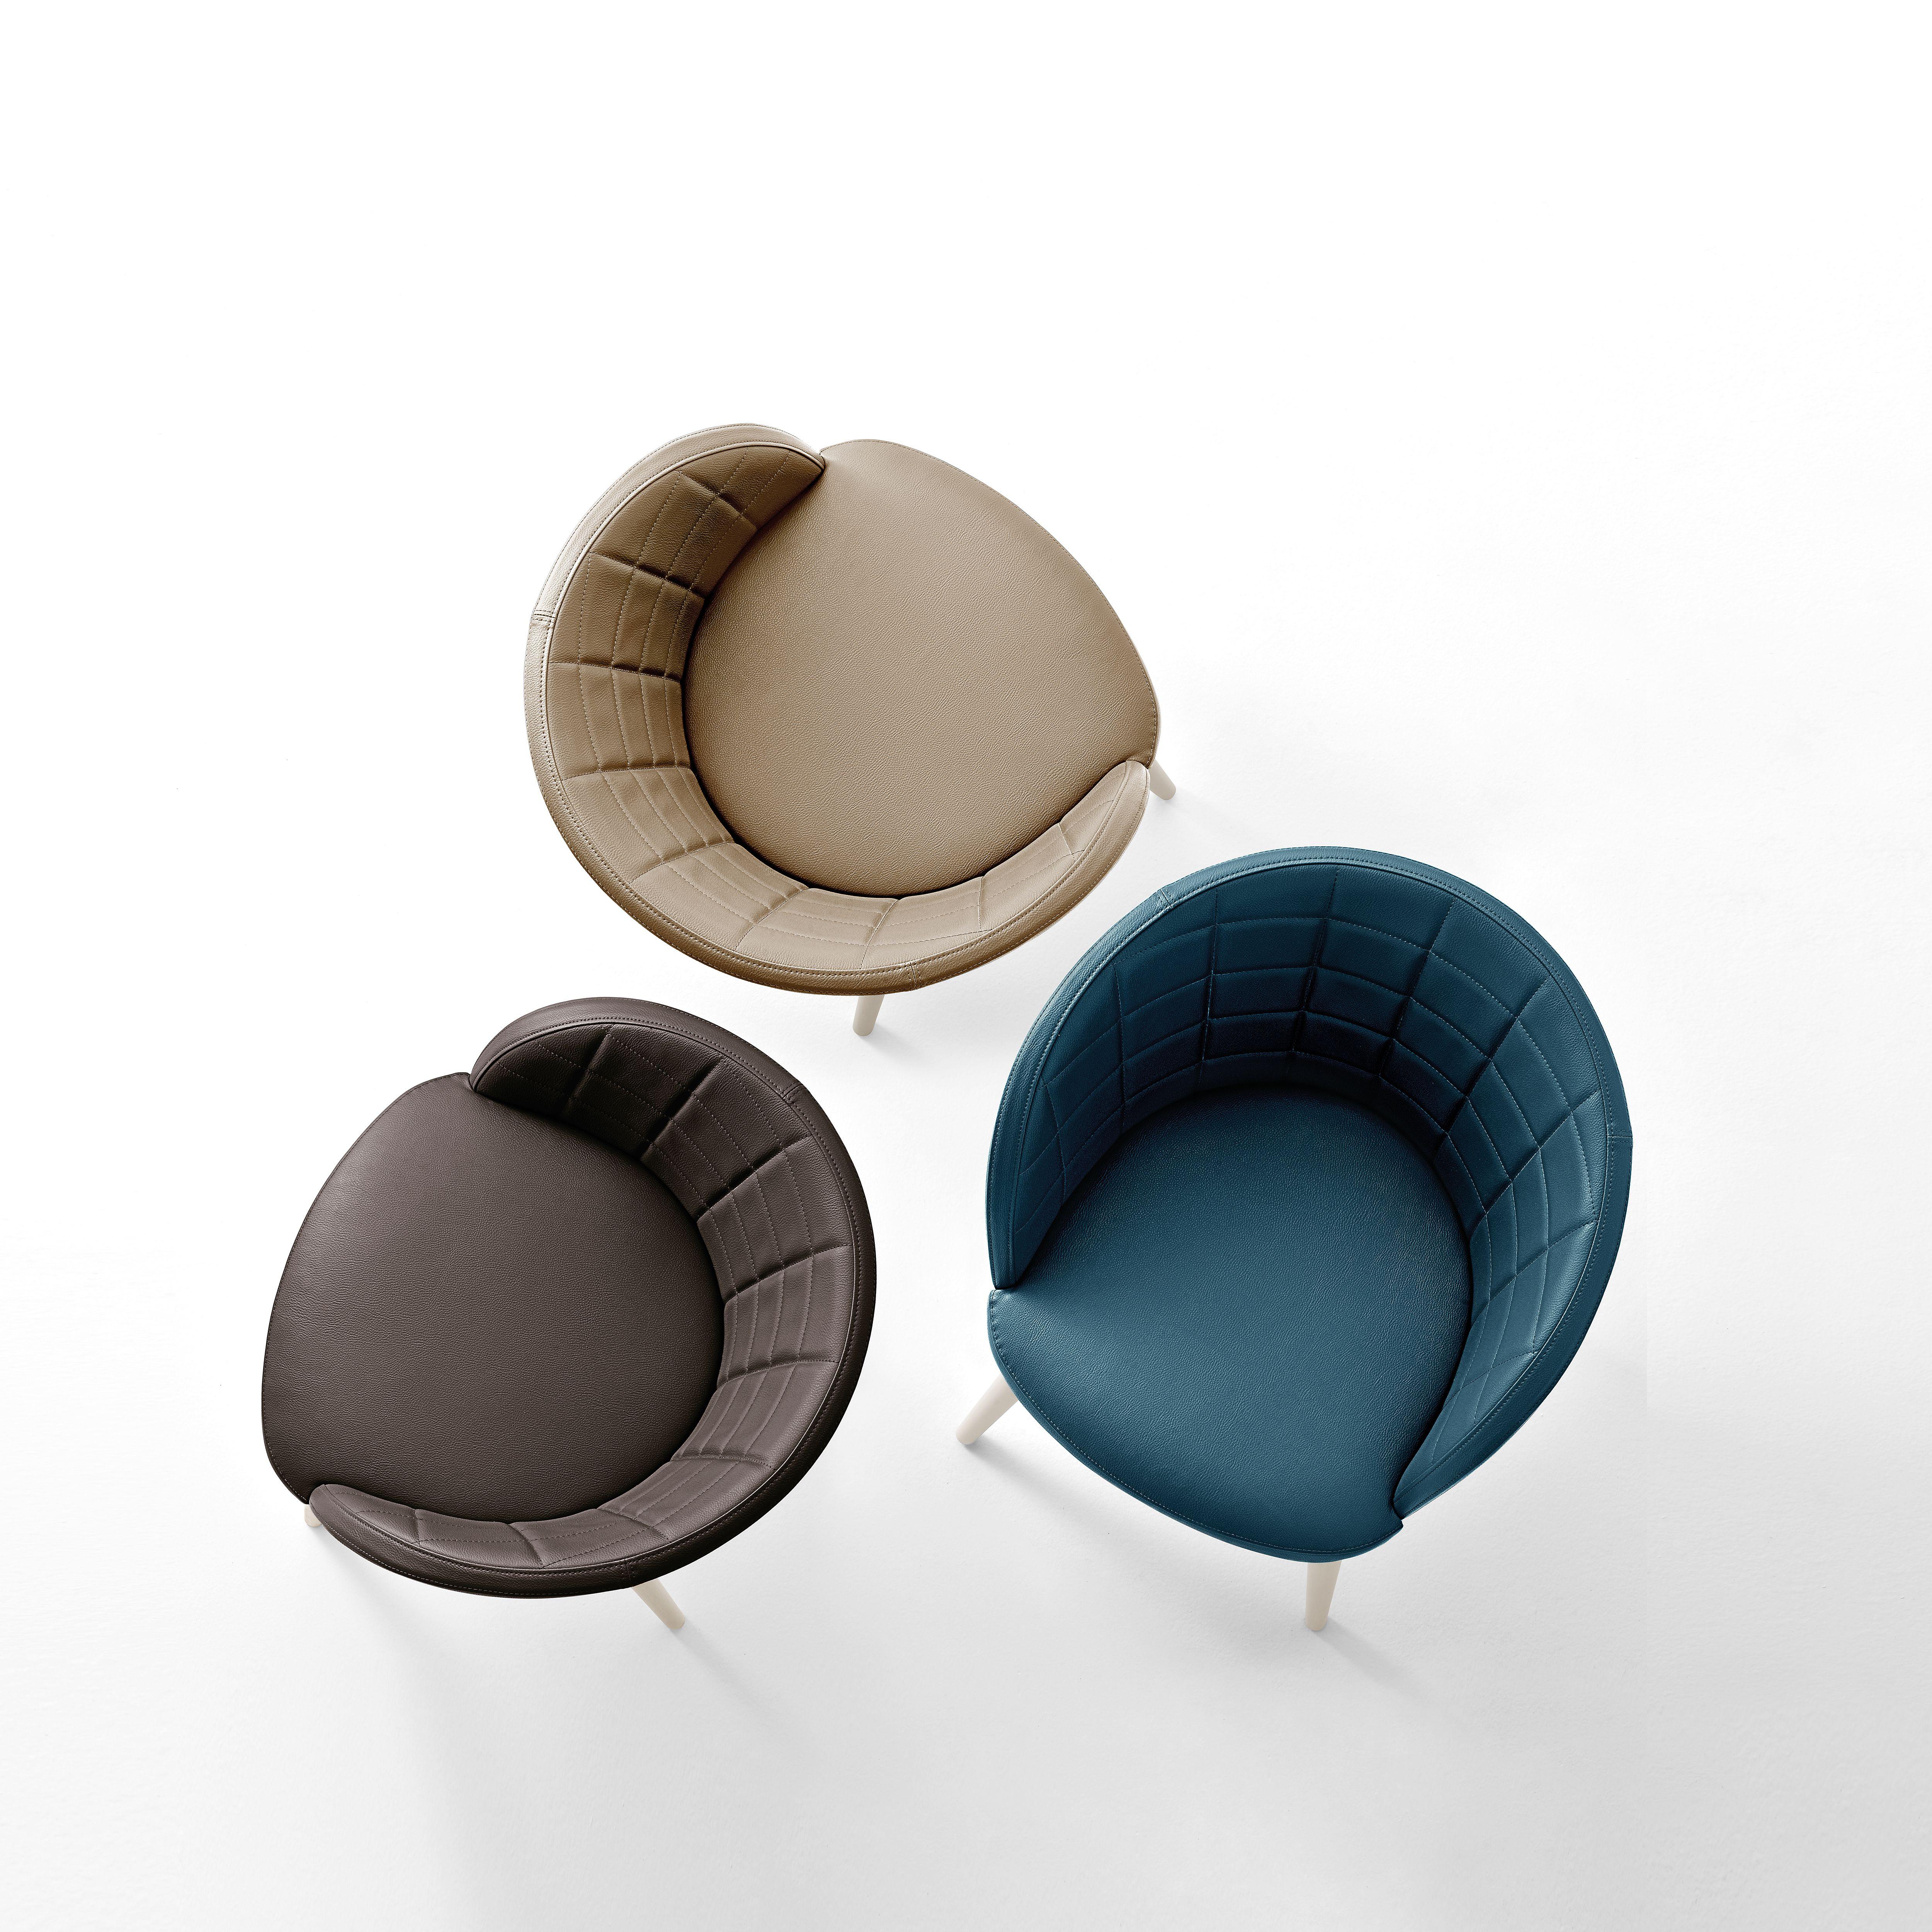 Rose 2.2-NS | Modern furniture sets, Textured bedding ...